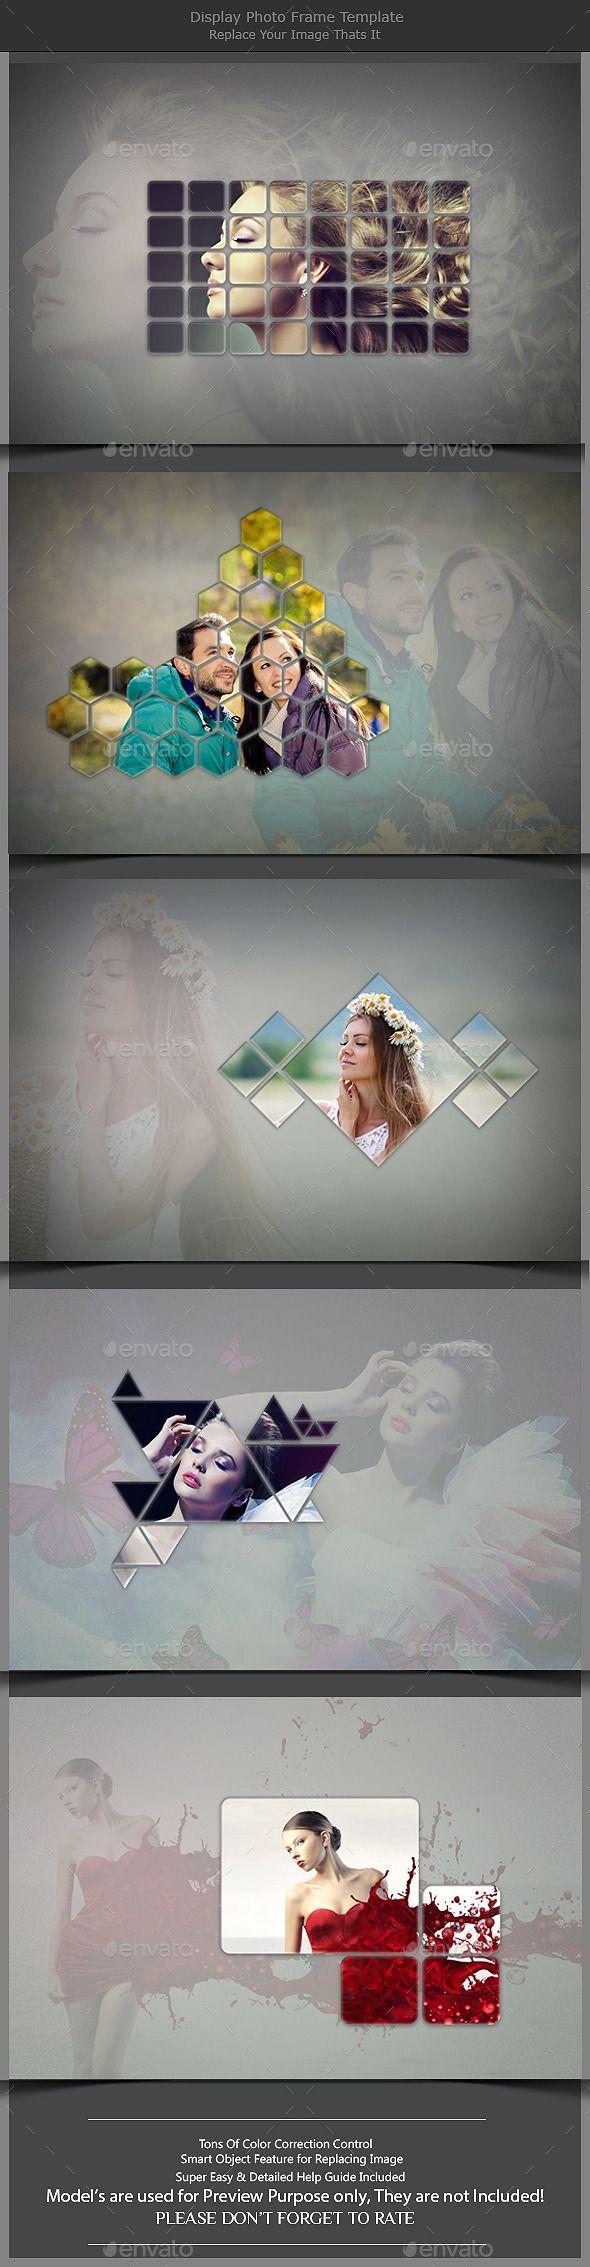 Display Photo Frame Template PSD Download: http://graphicriver.net/item/display-photo-frame-template-/11674011?ref=ksioks